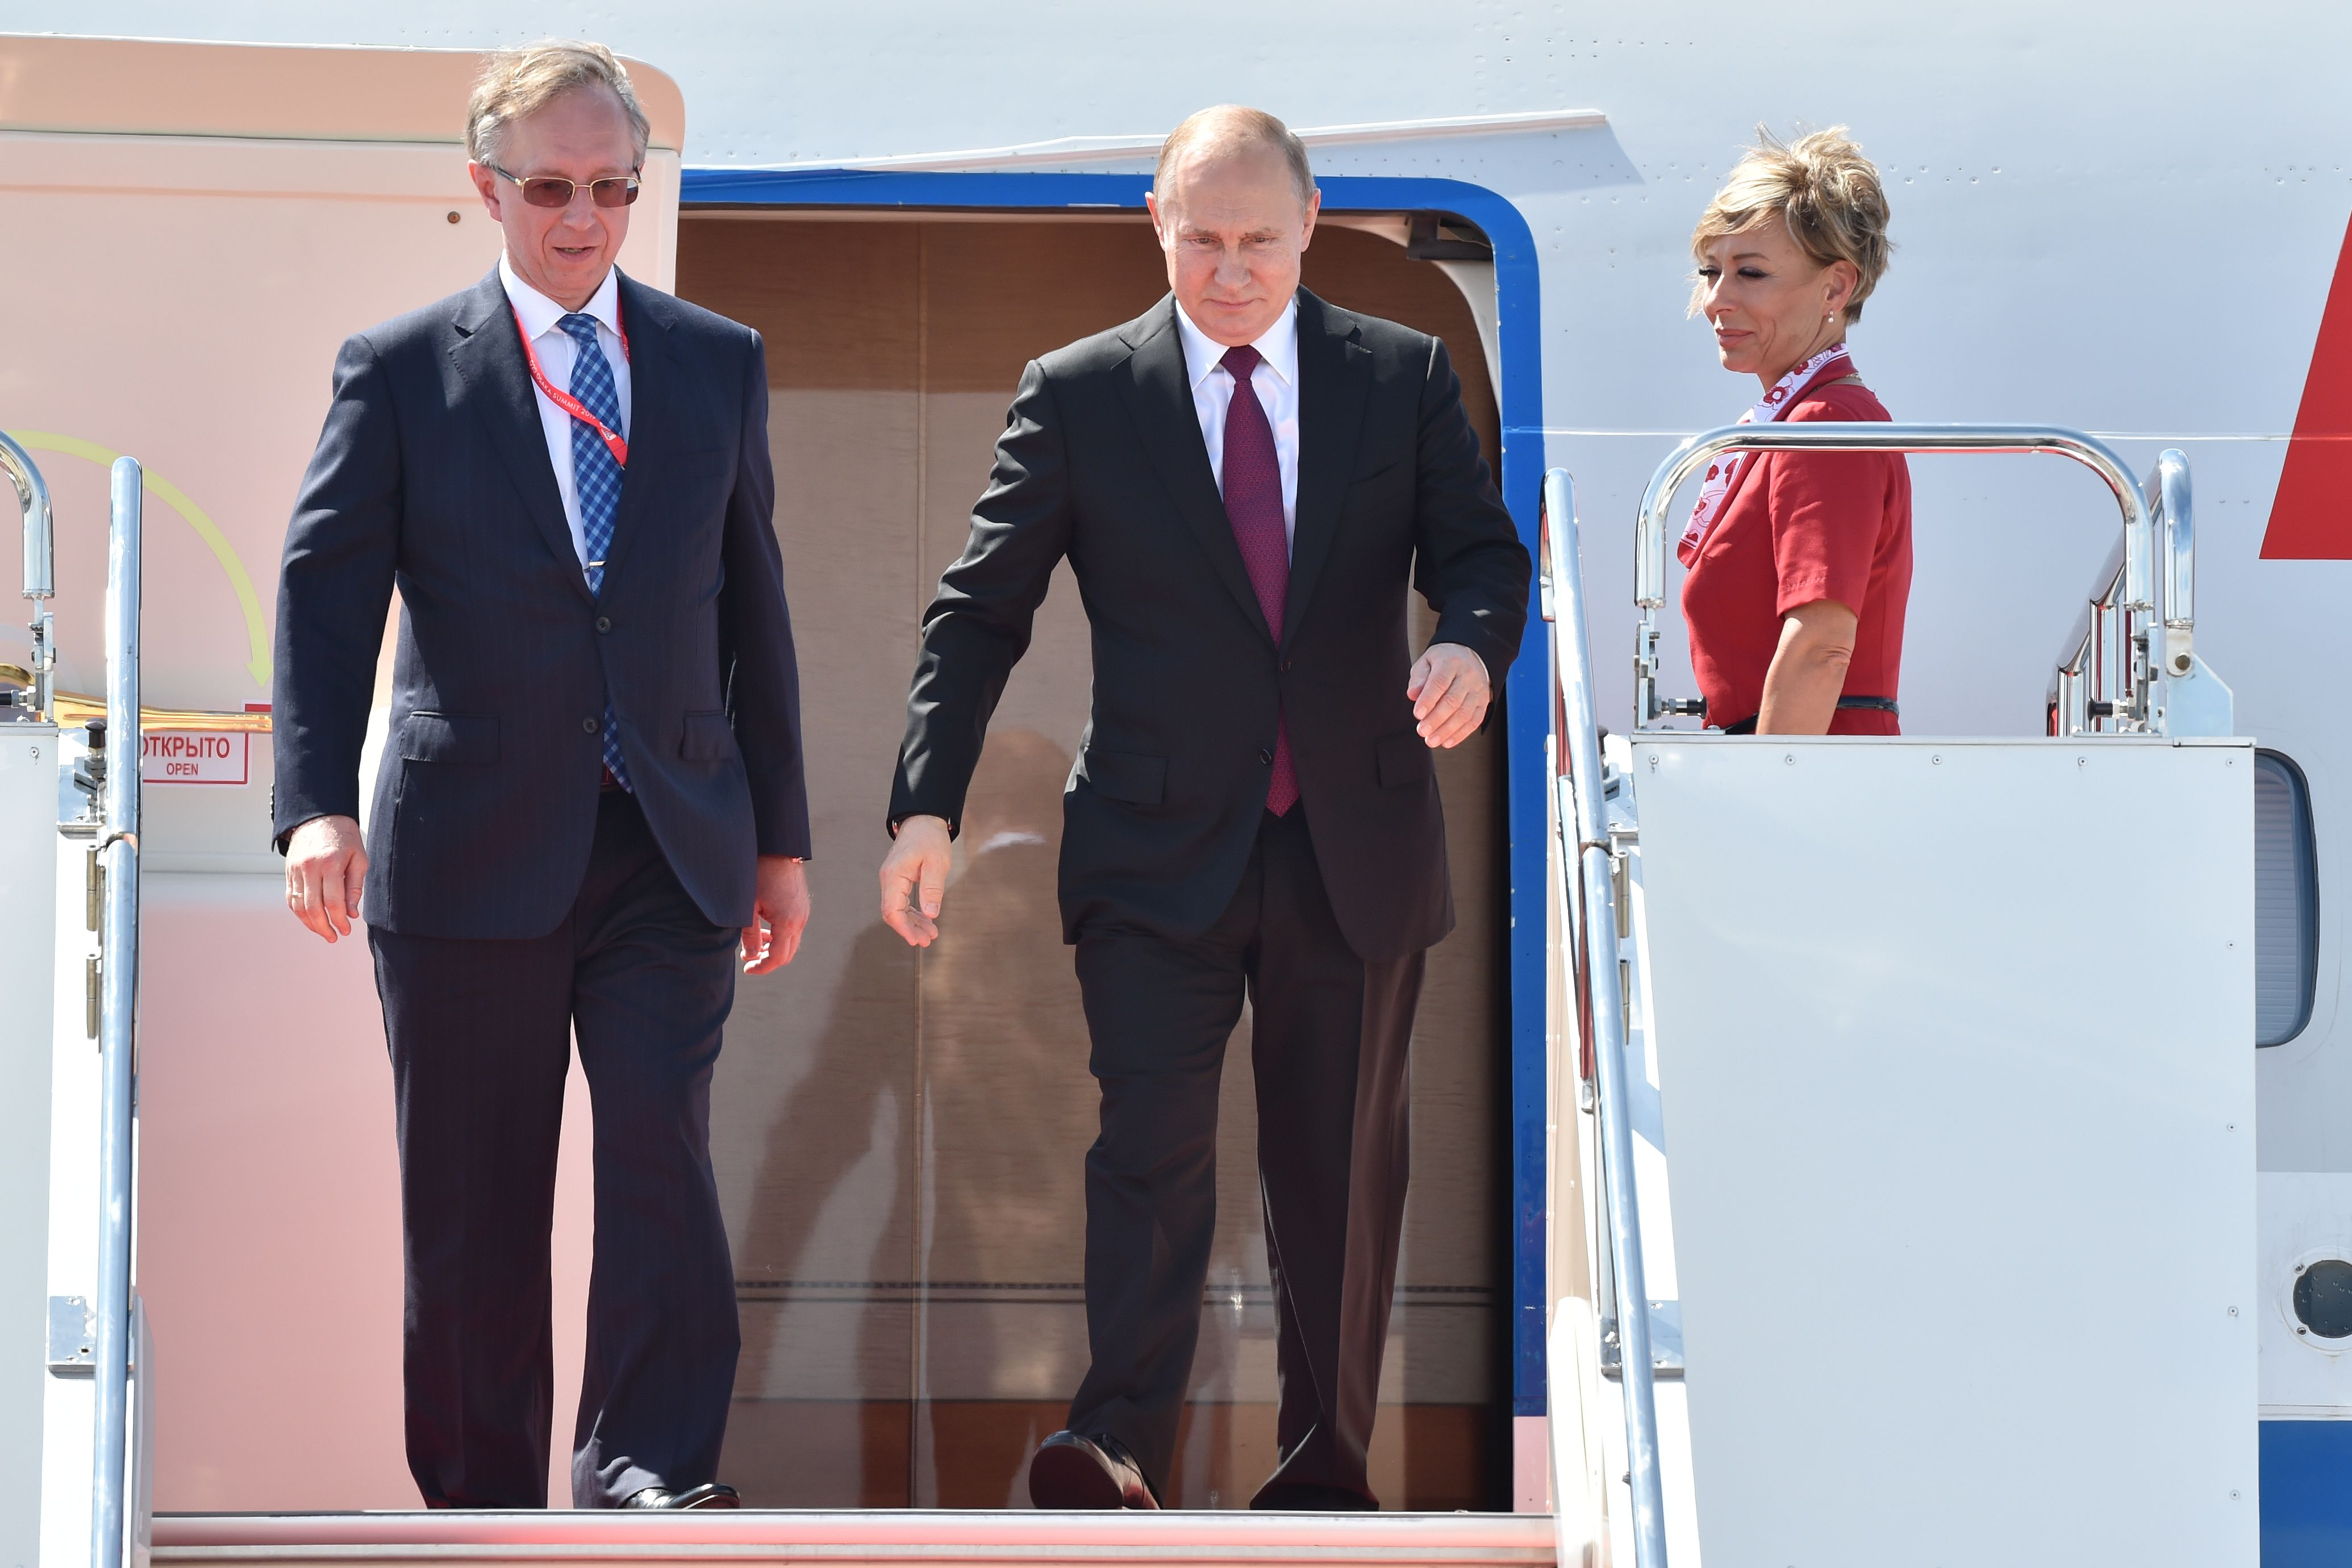 Russia's President Vladimir Putin arrives at Kansai International Airport prior to the G20 Osaka Summit in Osaka Prefecture on June 28.